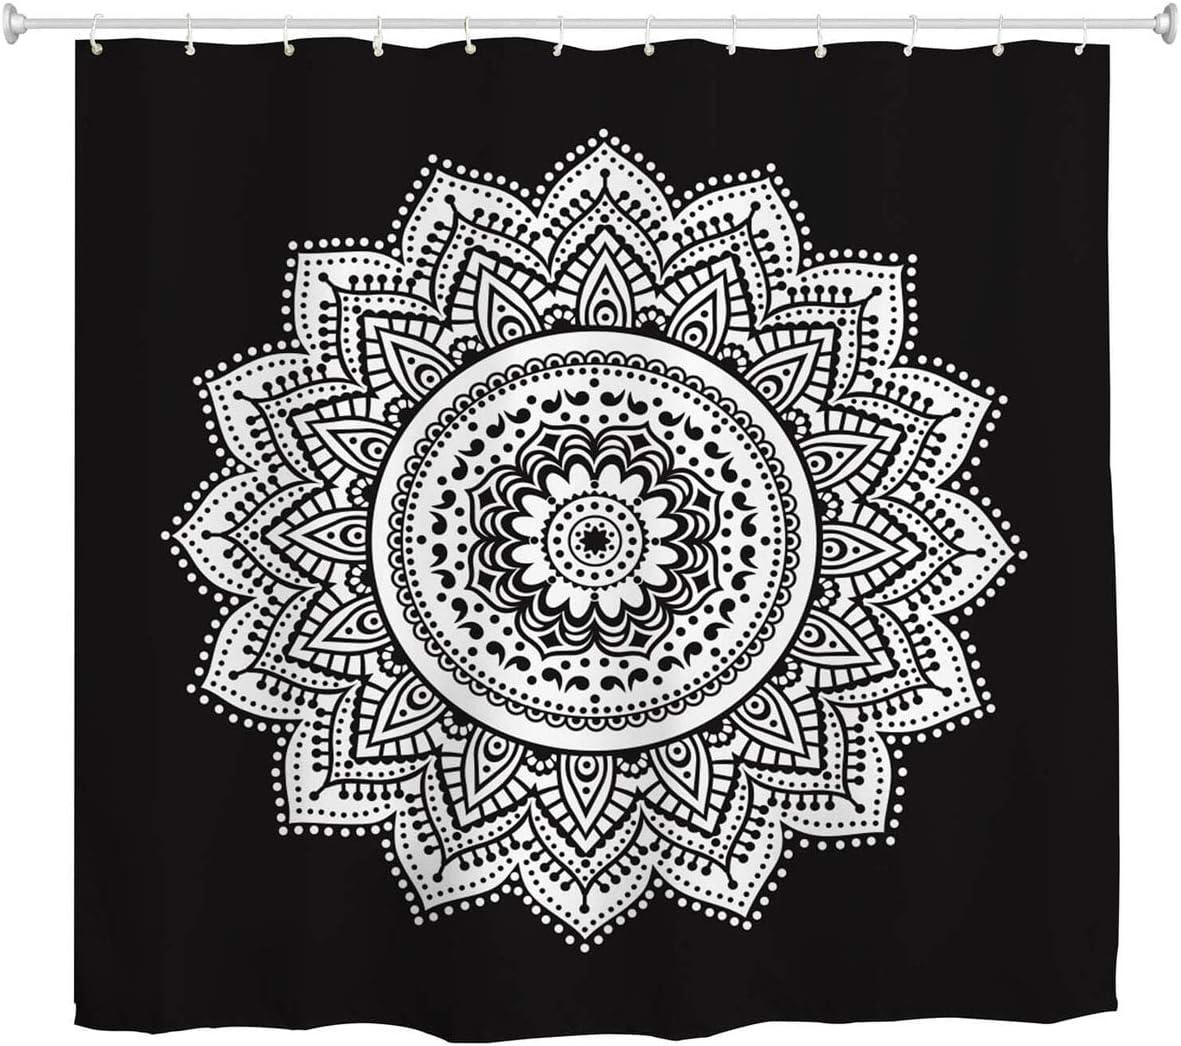 Amazon Com Black And White Mandala Shower Curtain Ethnic Retro Bohemian Paisley Floral Pattern Bath Curtain Boho Waterproof Fabric Bathroom Decor Set With Hooks 72 Inch Long Kitchen Dining